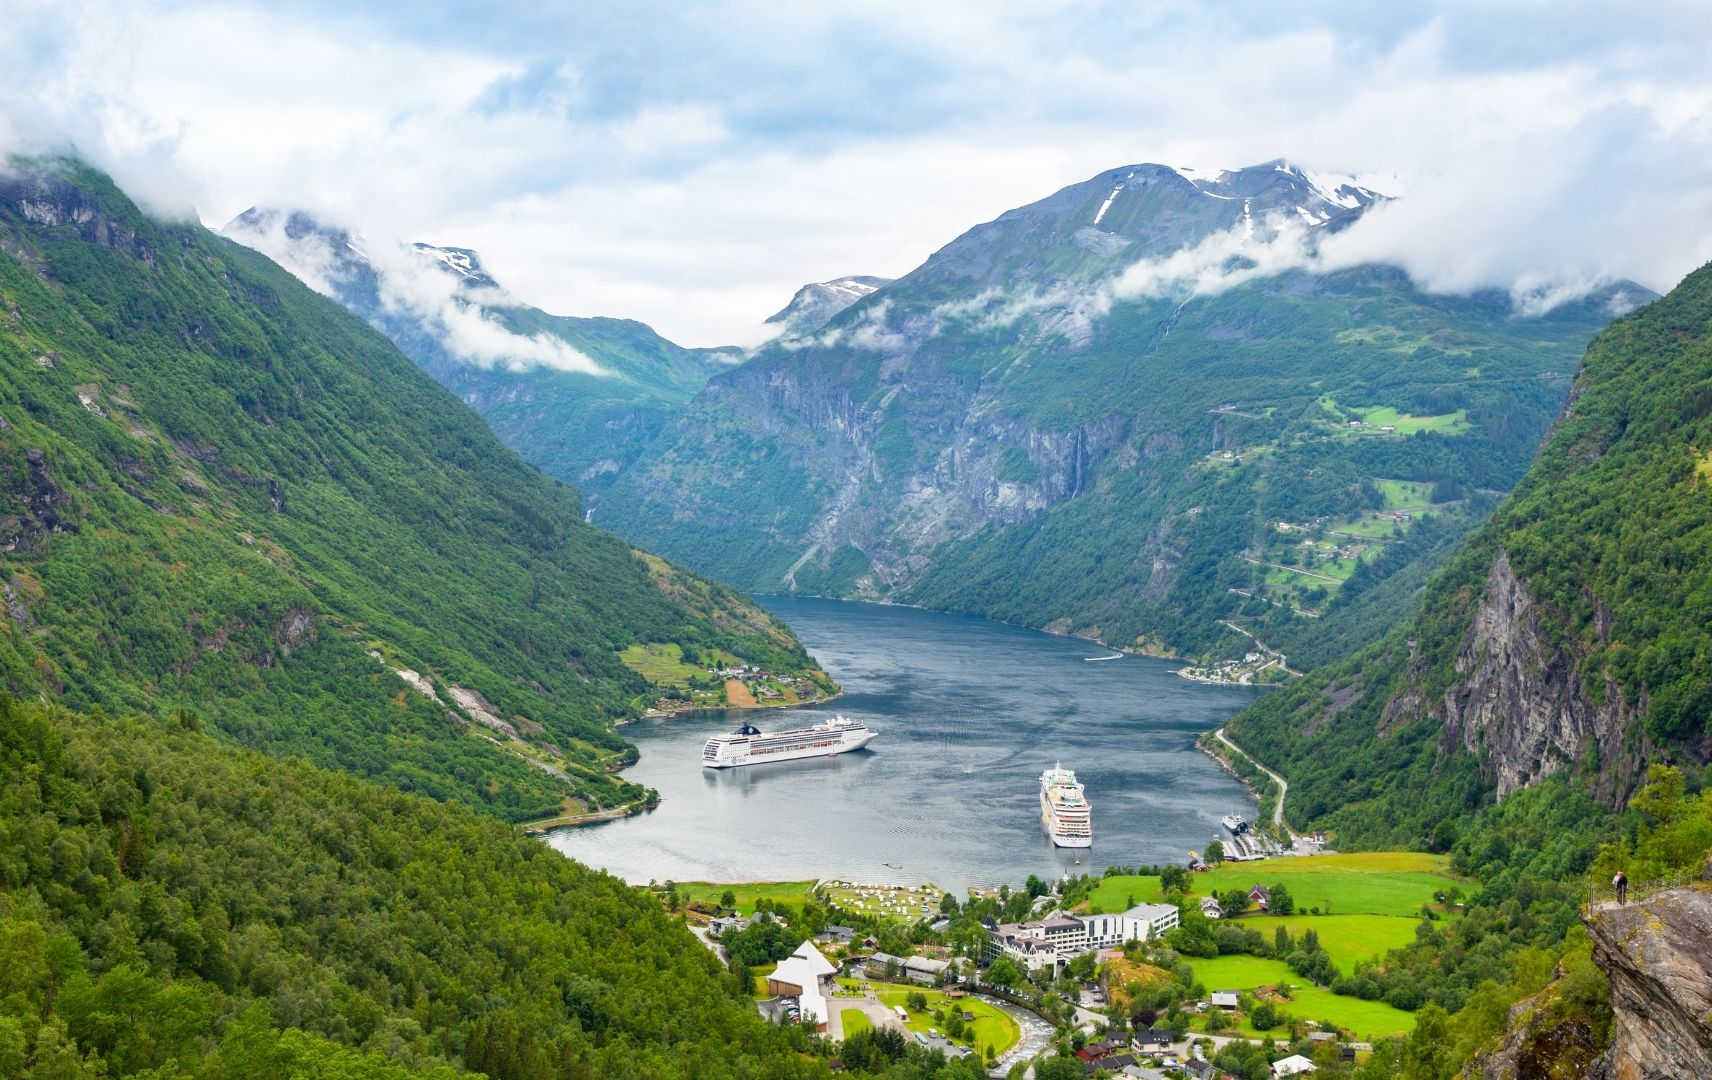 Kreuzfahrt top ten - Norwegen Berge und Hafen